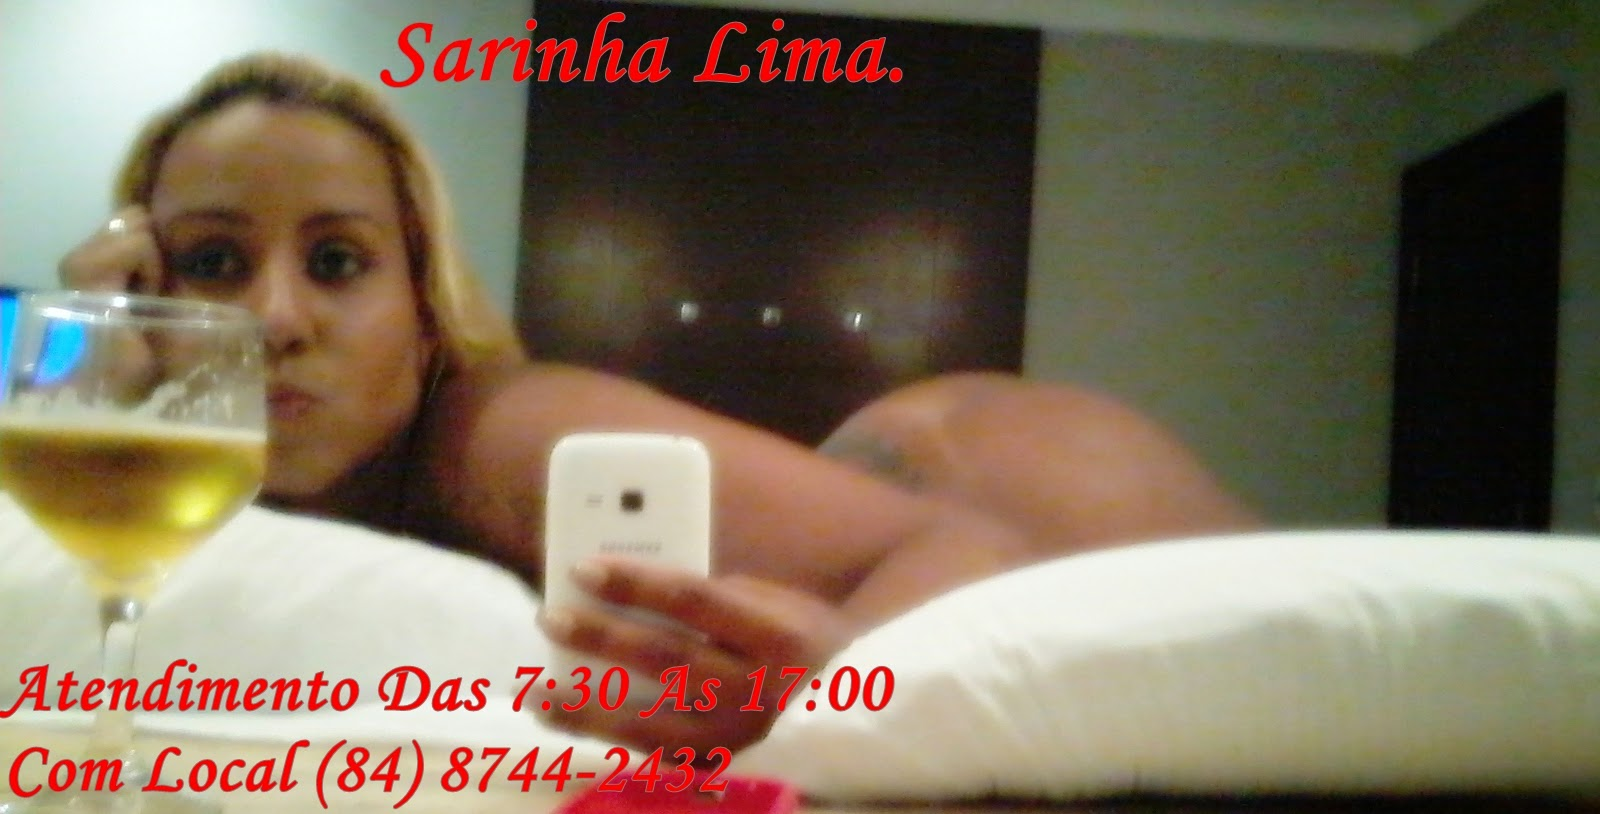 Sarinha Lima